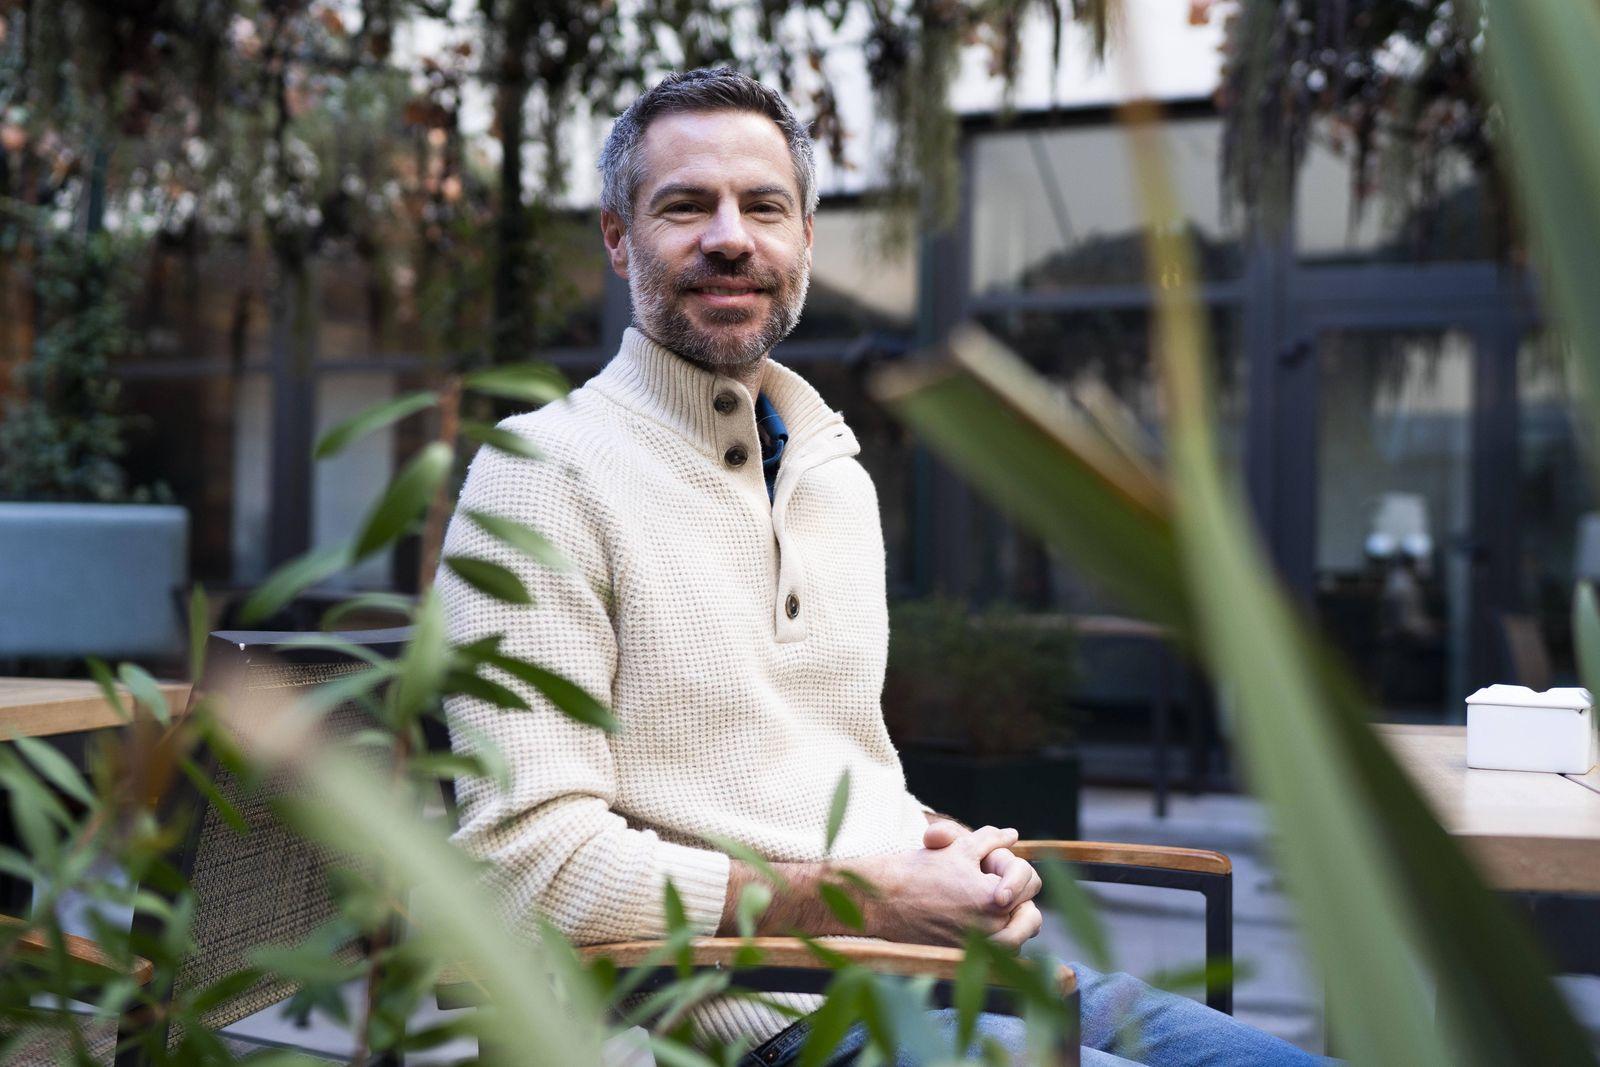 February 25 2019 Madrid Spain The American writer environmental policies Michael Shellenberge